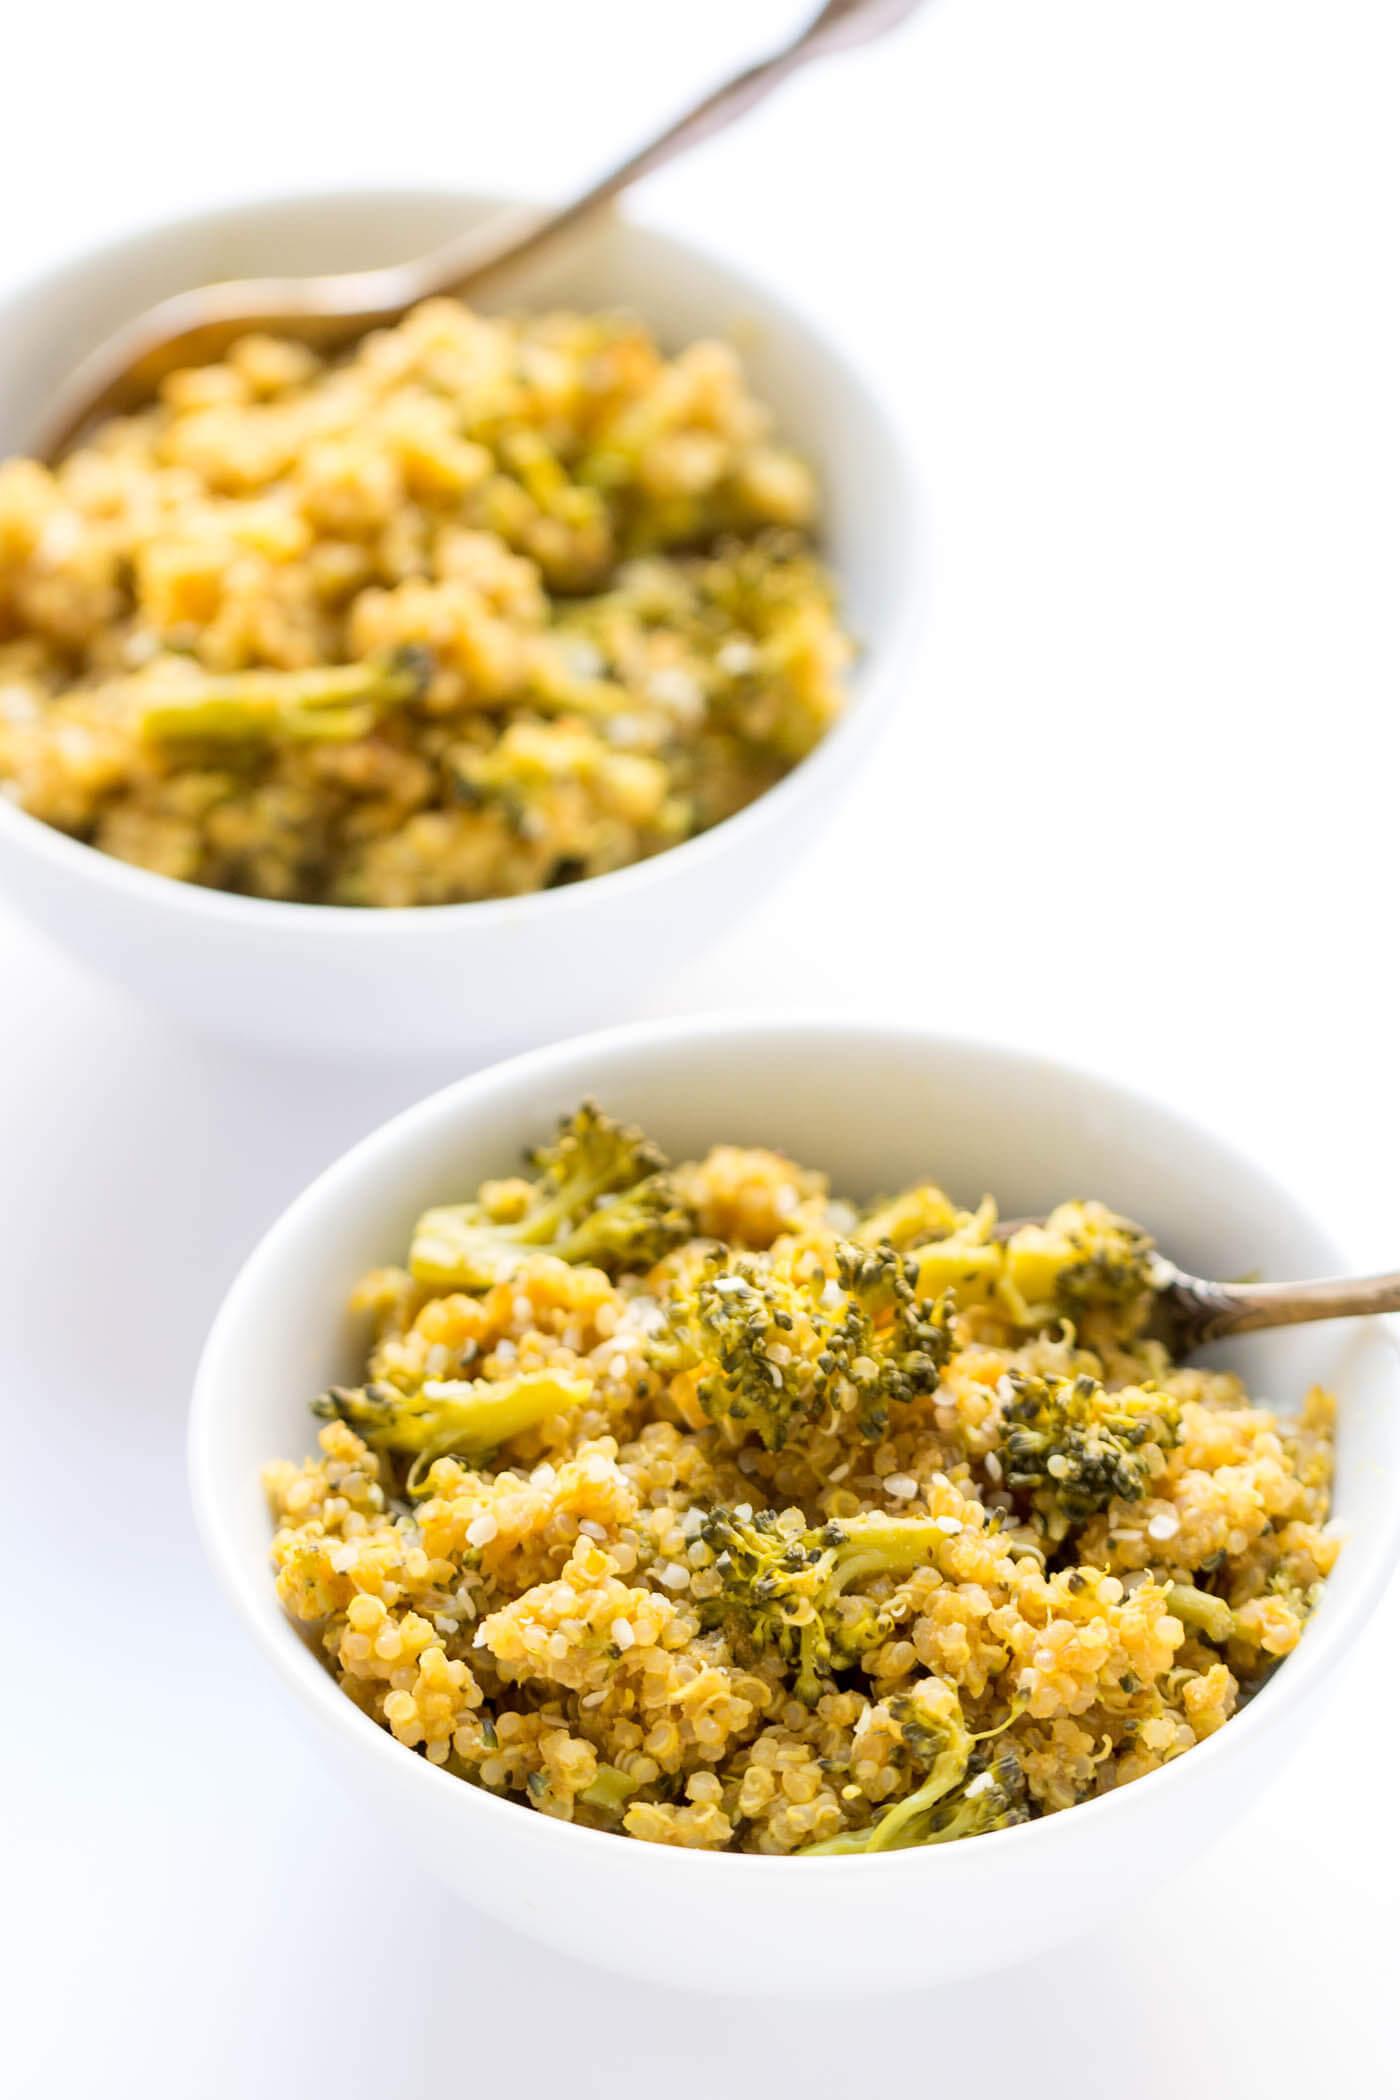 Vegan Broccoli and Quinoa Mac and Cheese